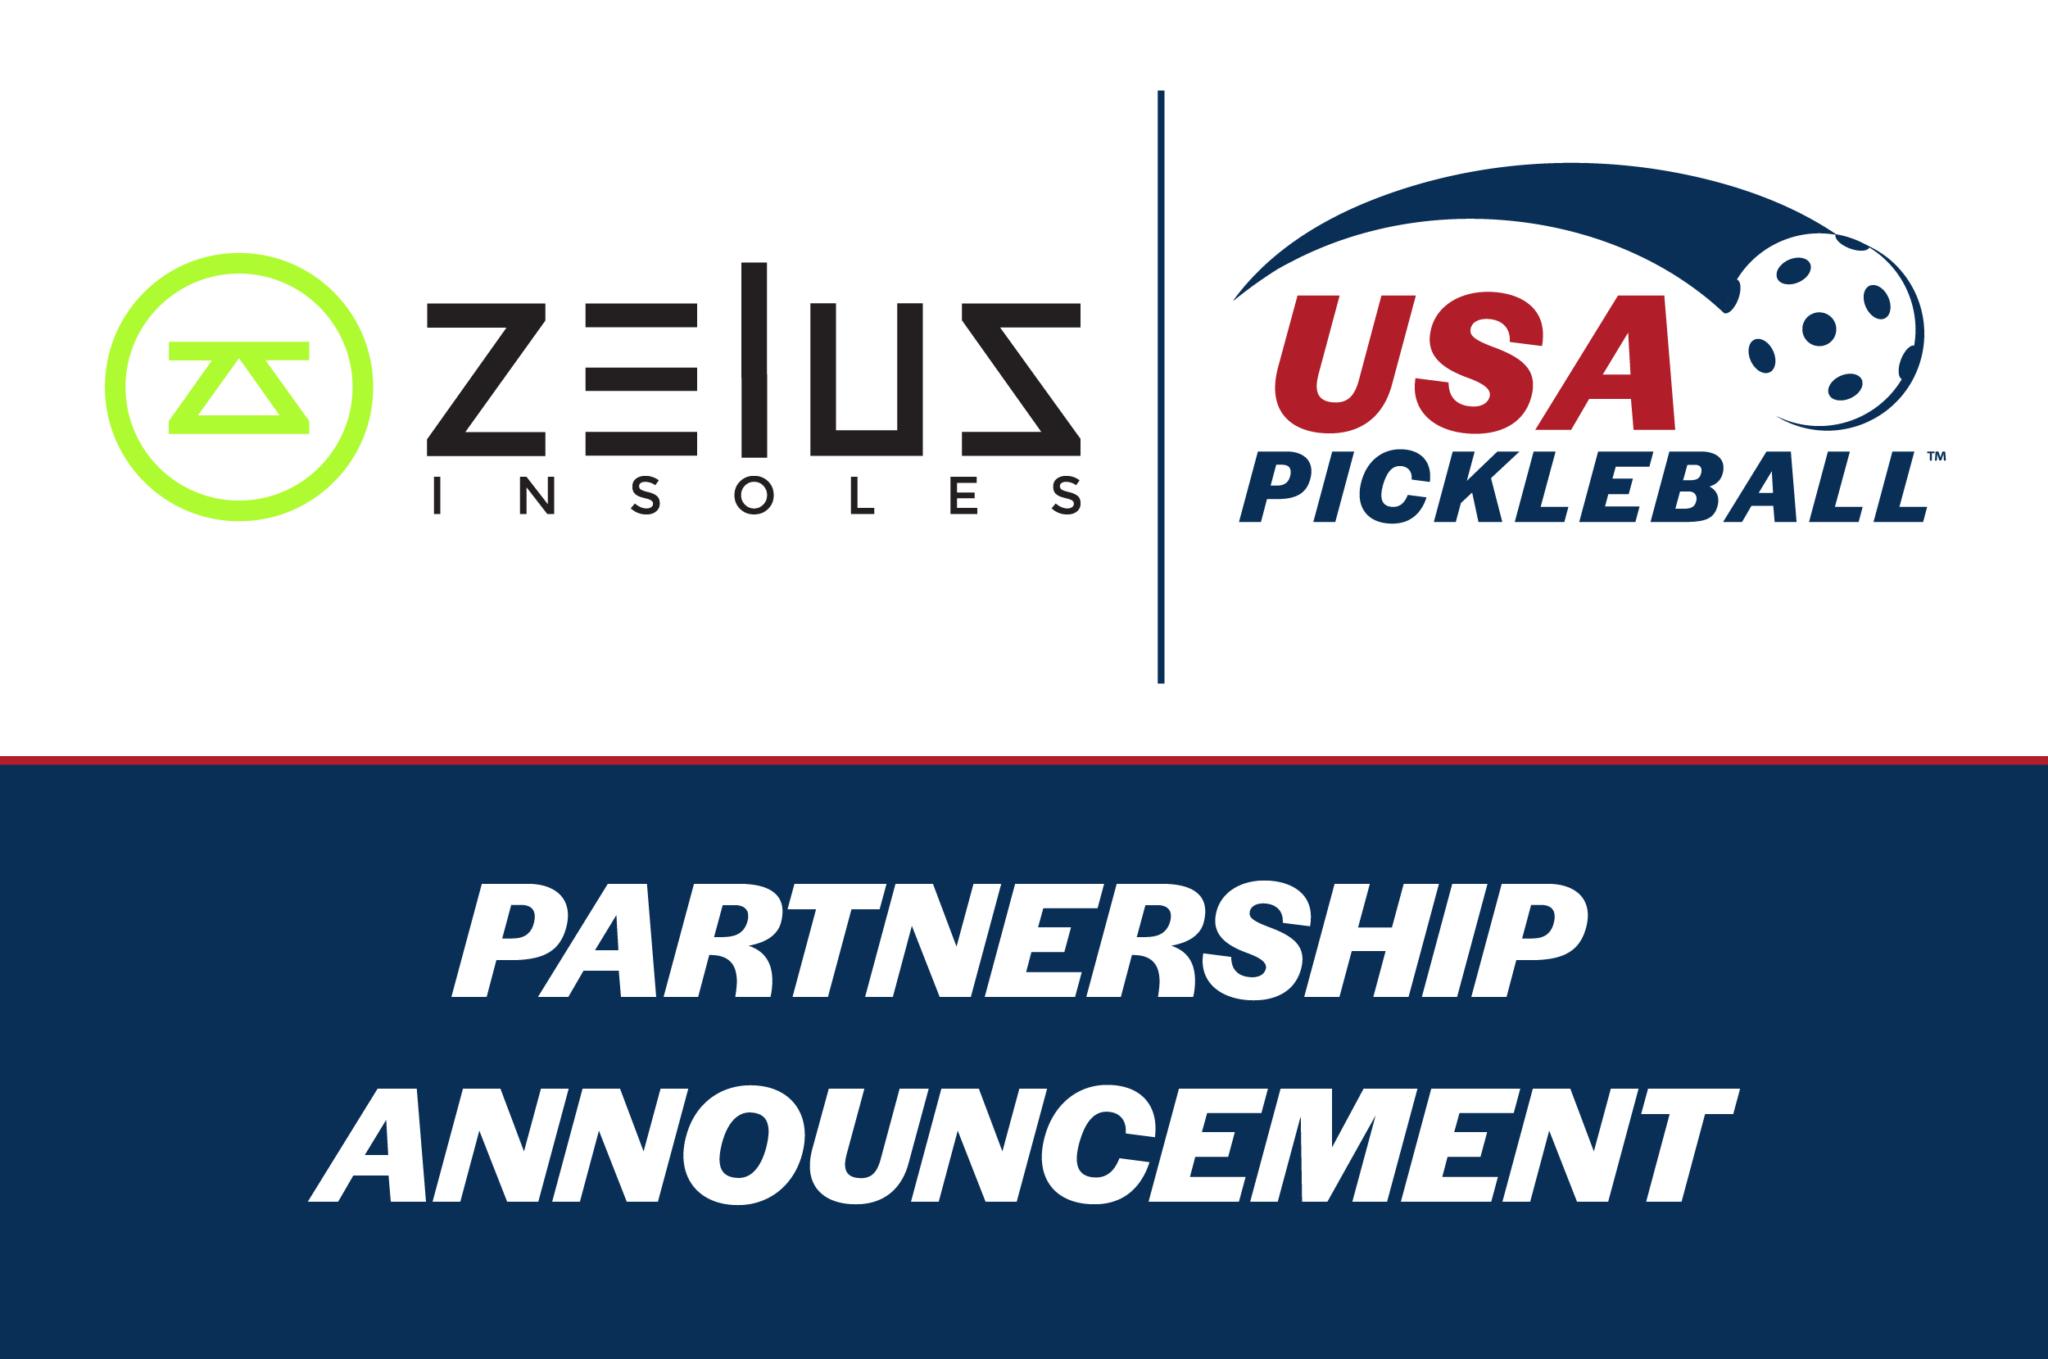 Zelus USA Pickleball web